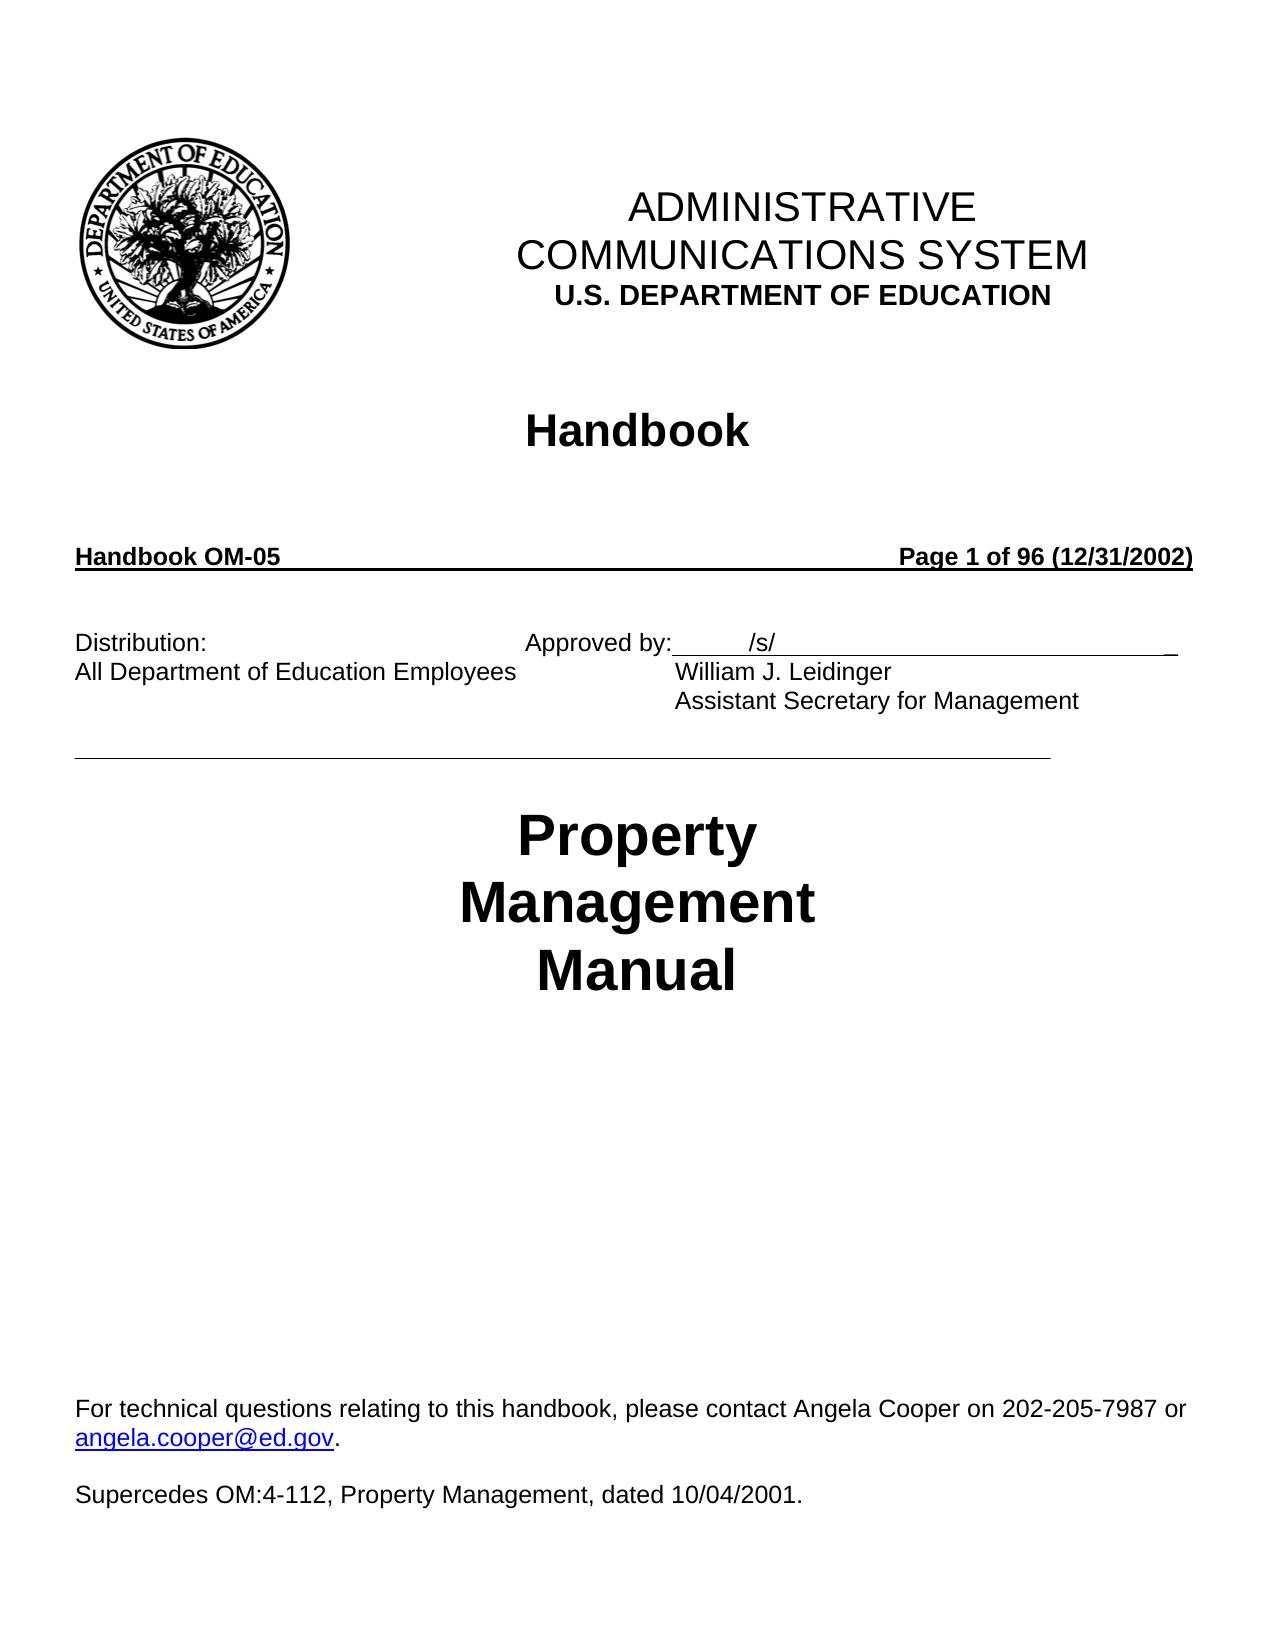 Handbook For Property Management